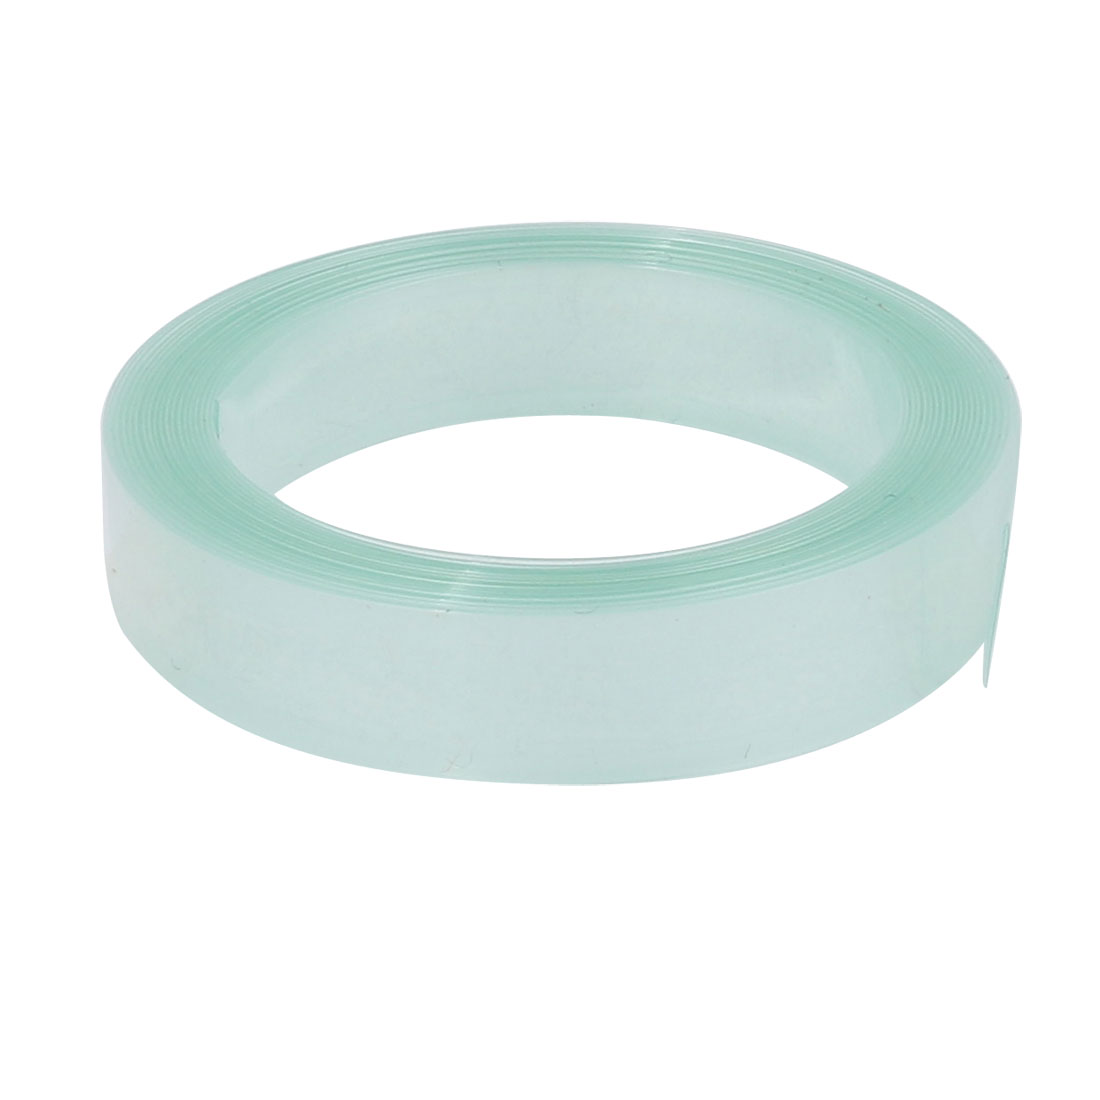 7mm Flat Width 2 Meters Long PVC Heat Shrinkable Tube Clear-green for Battery